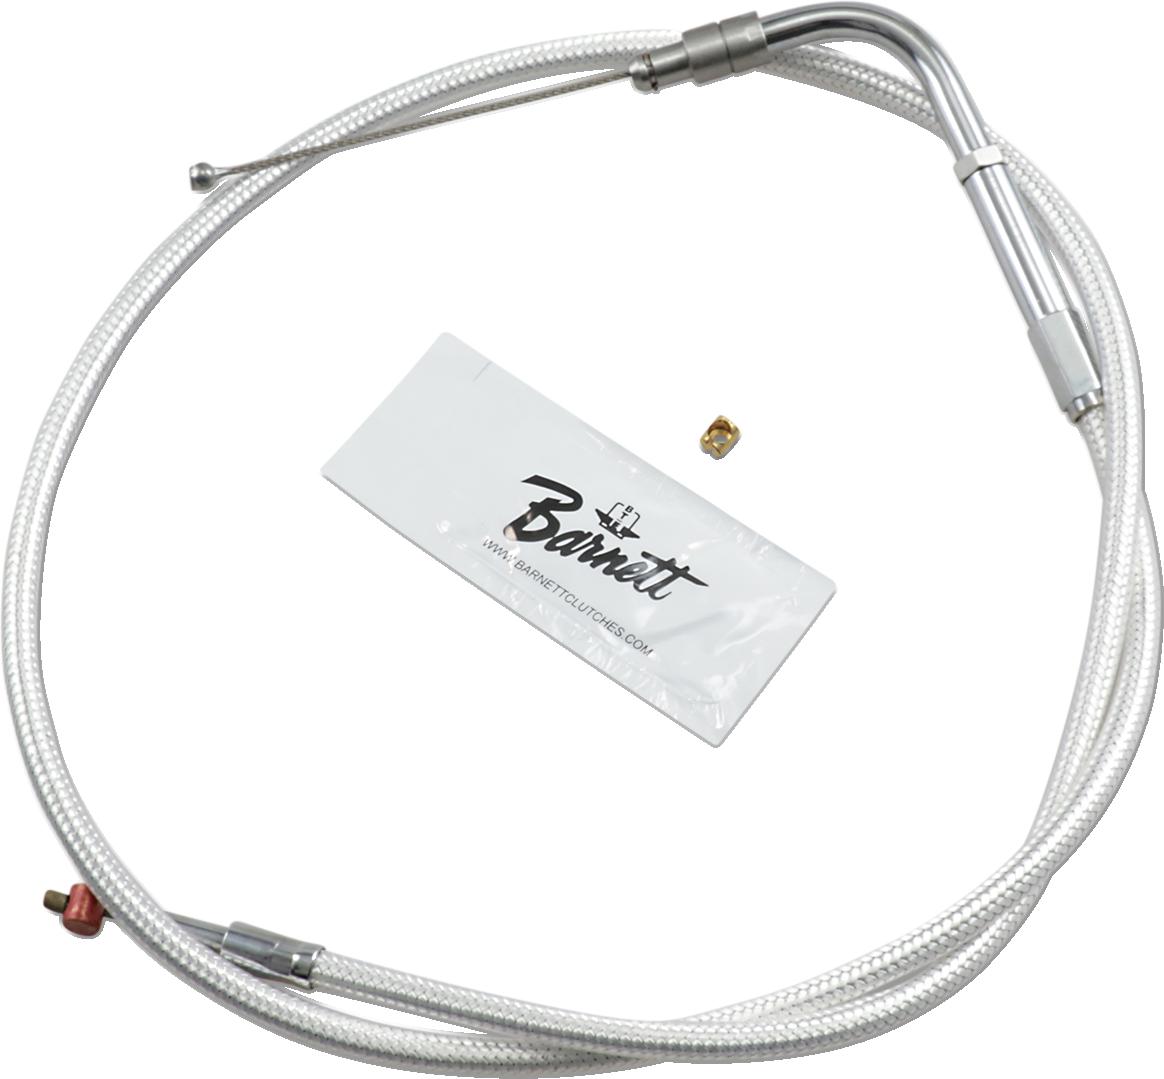 "Barnett Stainless Steel Throttle Cables Natural Plus 6/"" 102-85-30003-06"